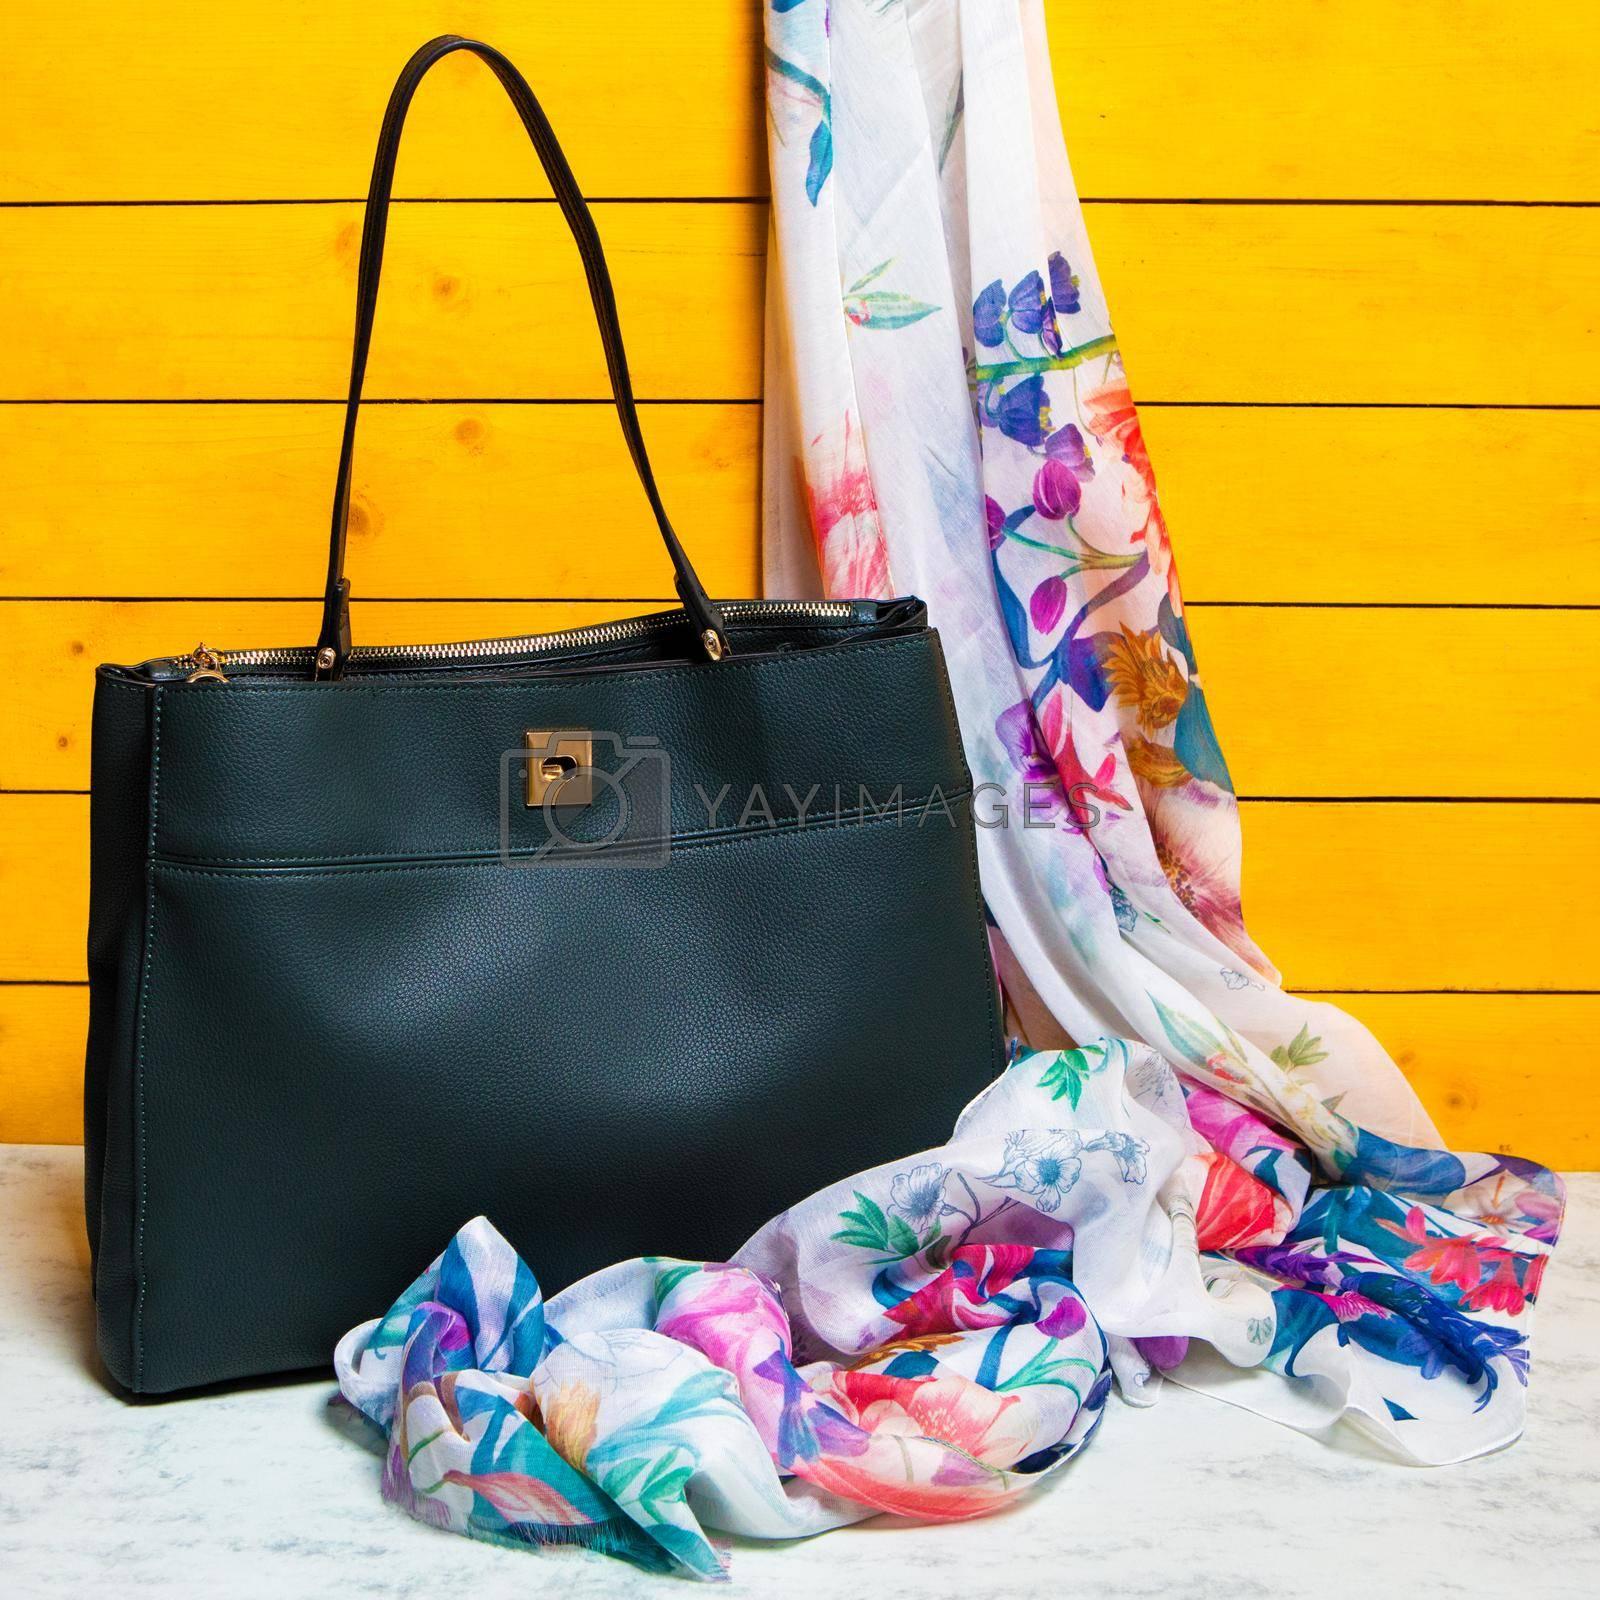 Black woman handbag with a scarf isolated